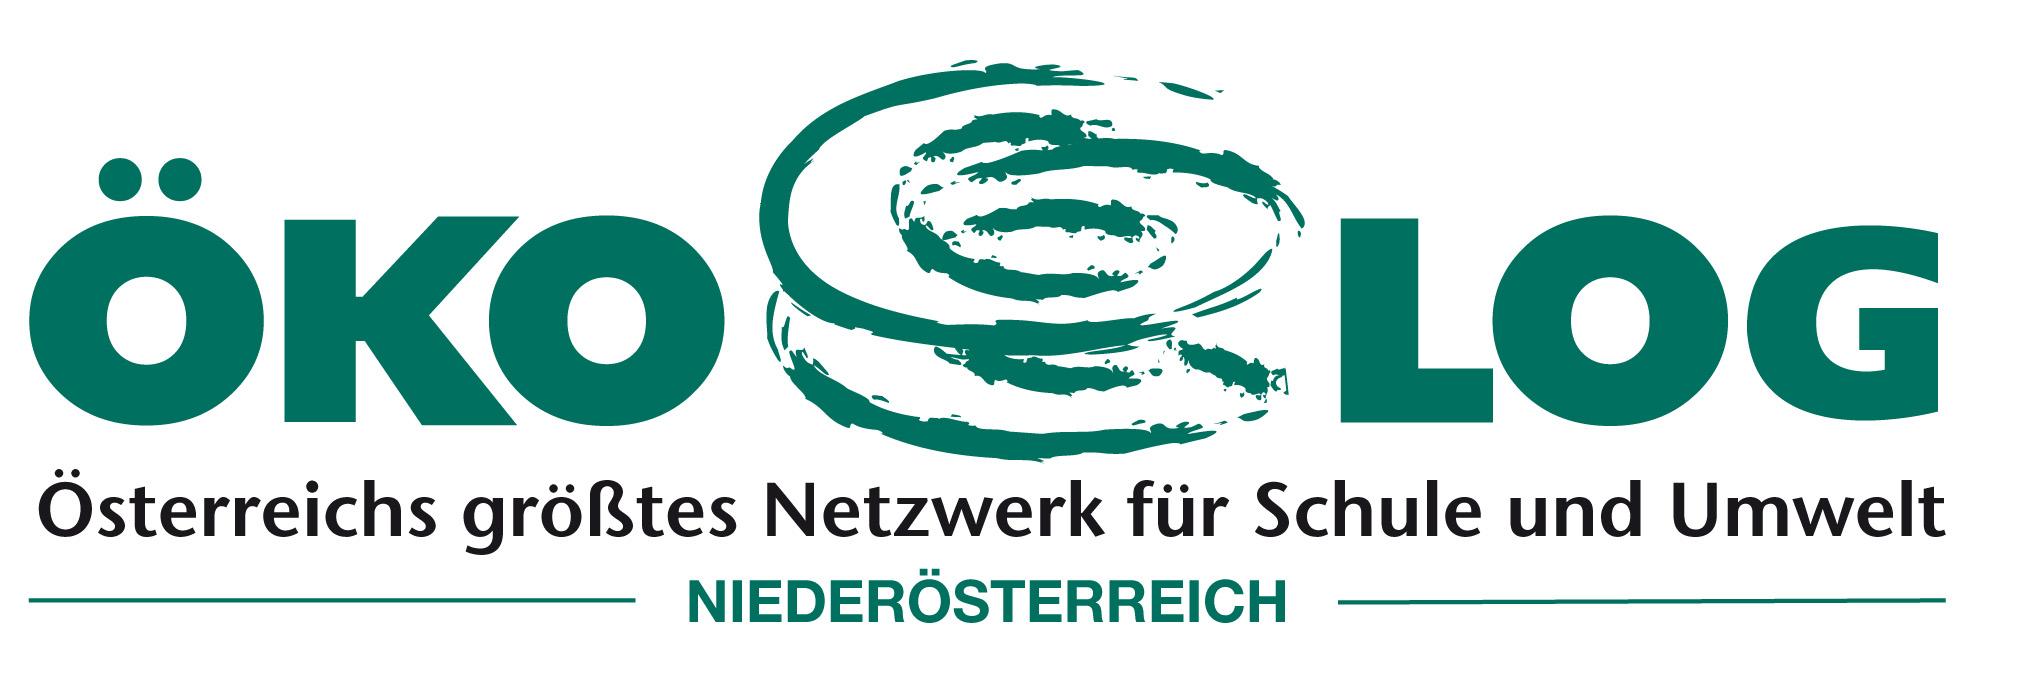 Ökolog Logo